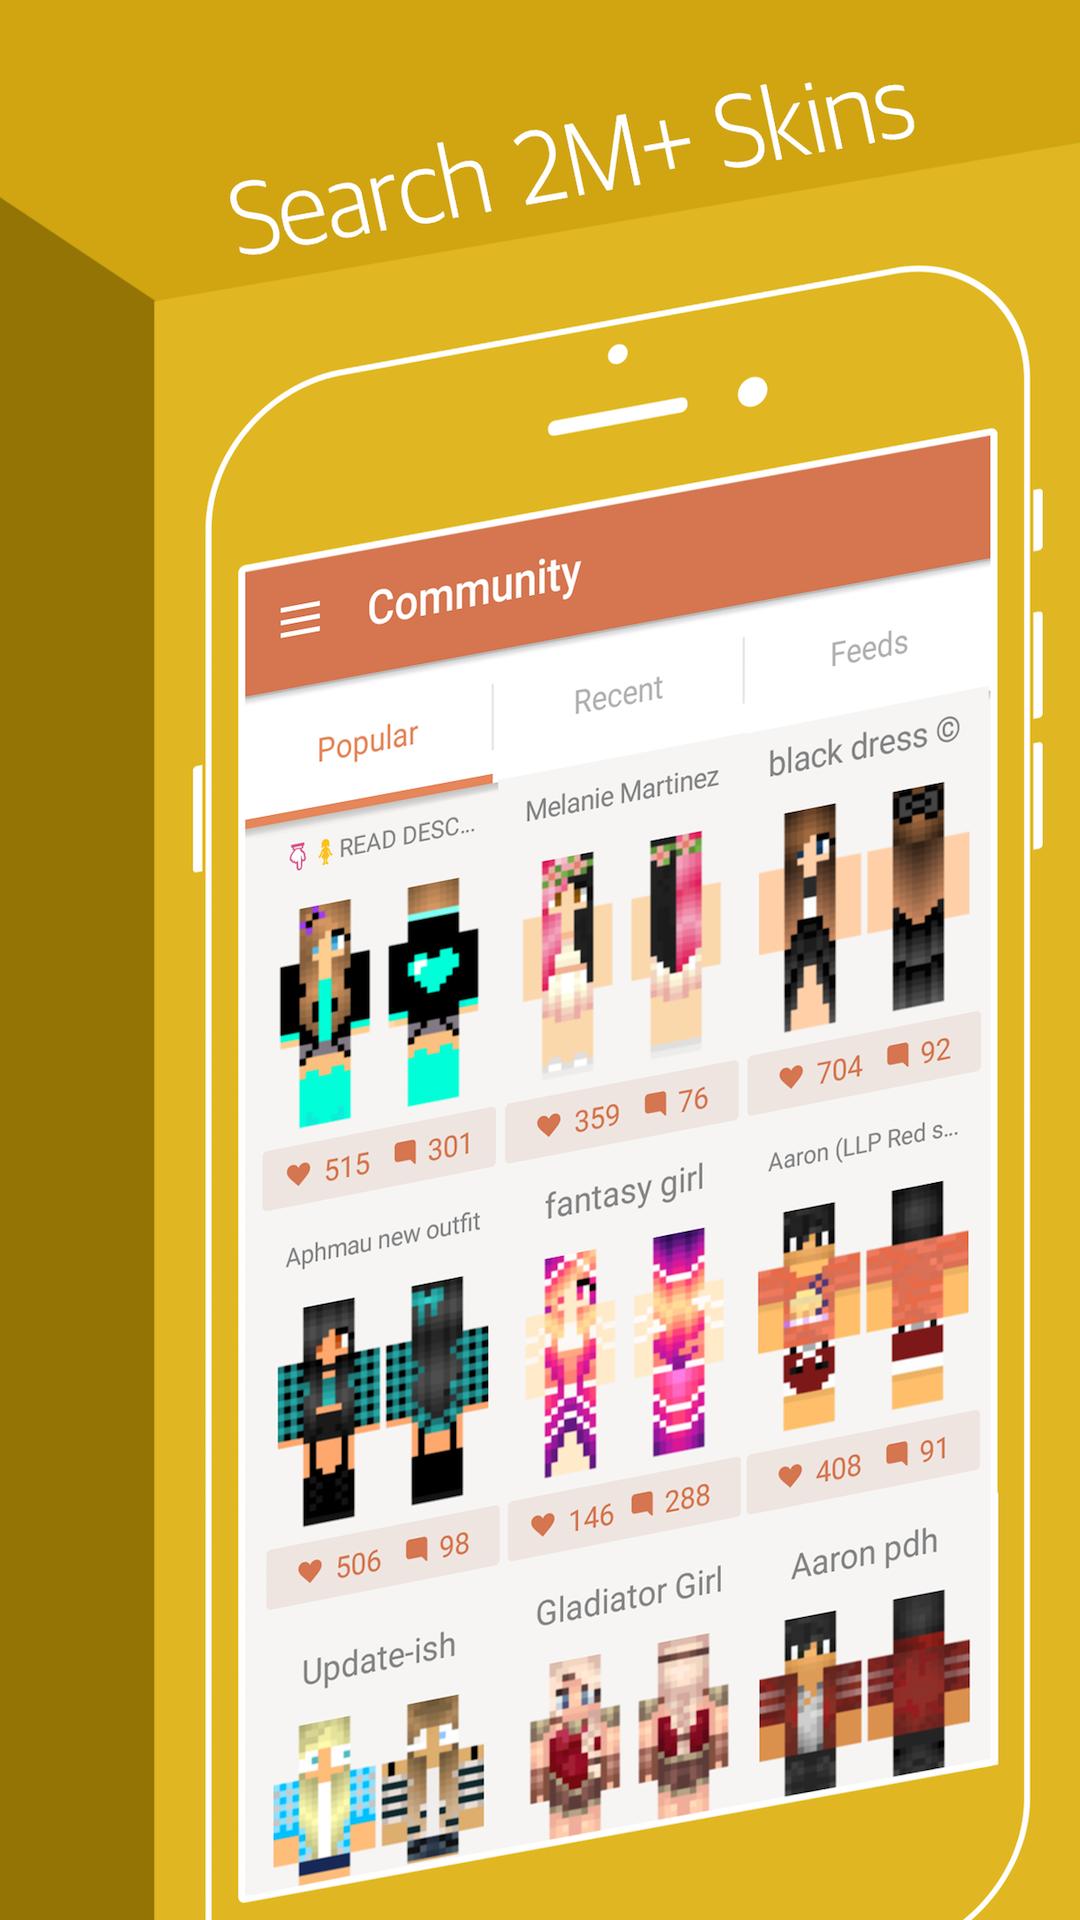 Amazon.com: Skinseed - Skin Creator & Skins Editor for ...